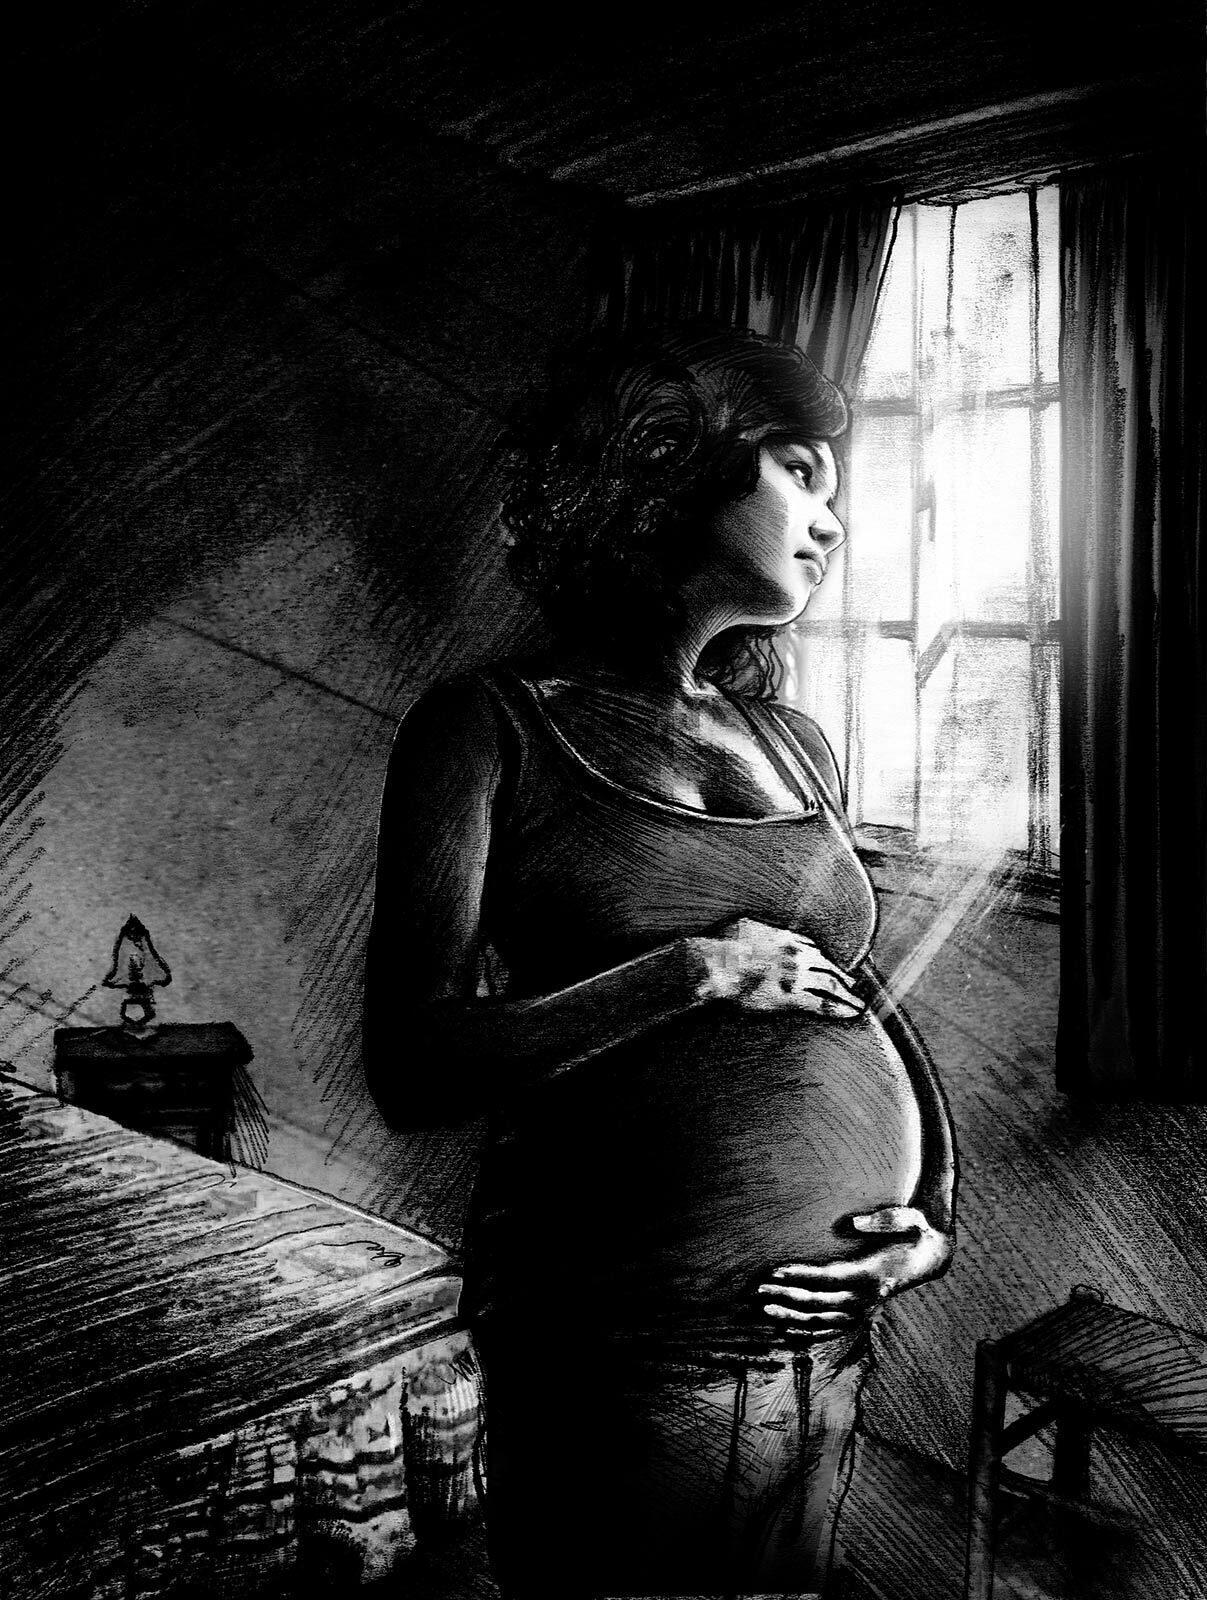 Young woman sad pregnant window illustration - Kornel Illustration | Kornel Stadler portfolio